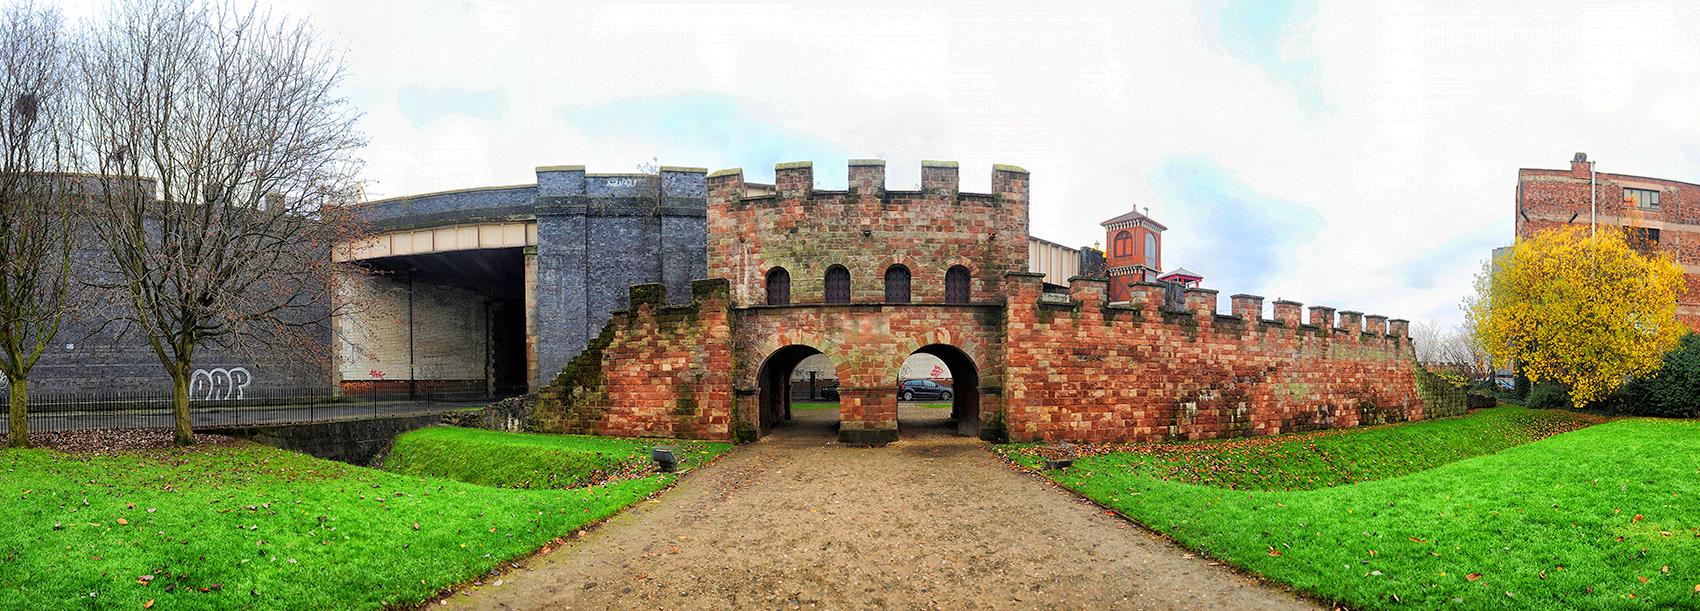 Mamucium Roman Fort, Castlefield Urban Heritage Park Manchester